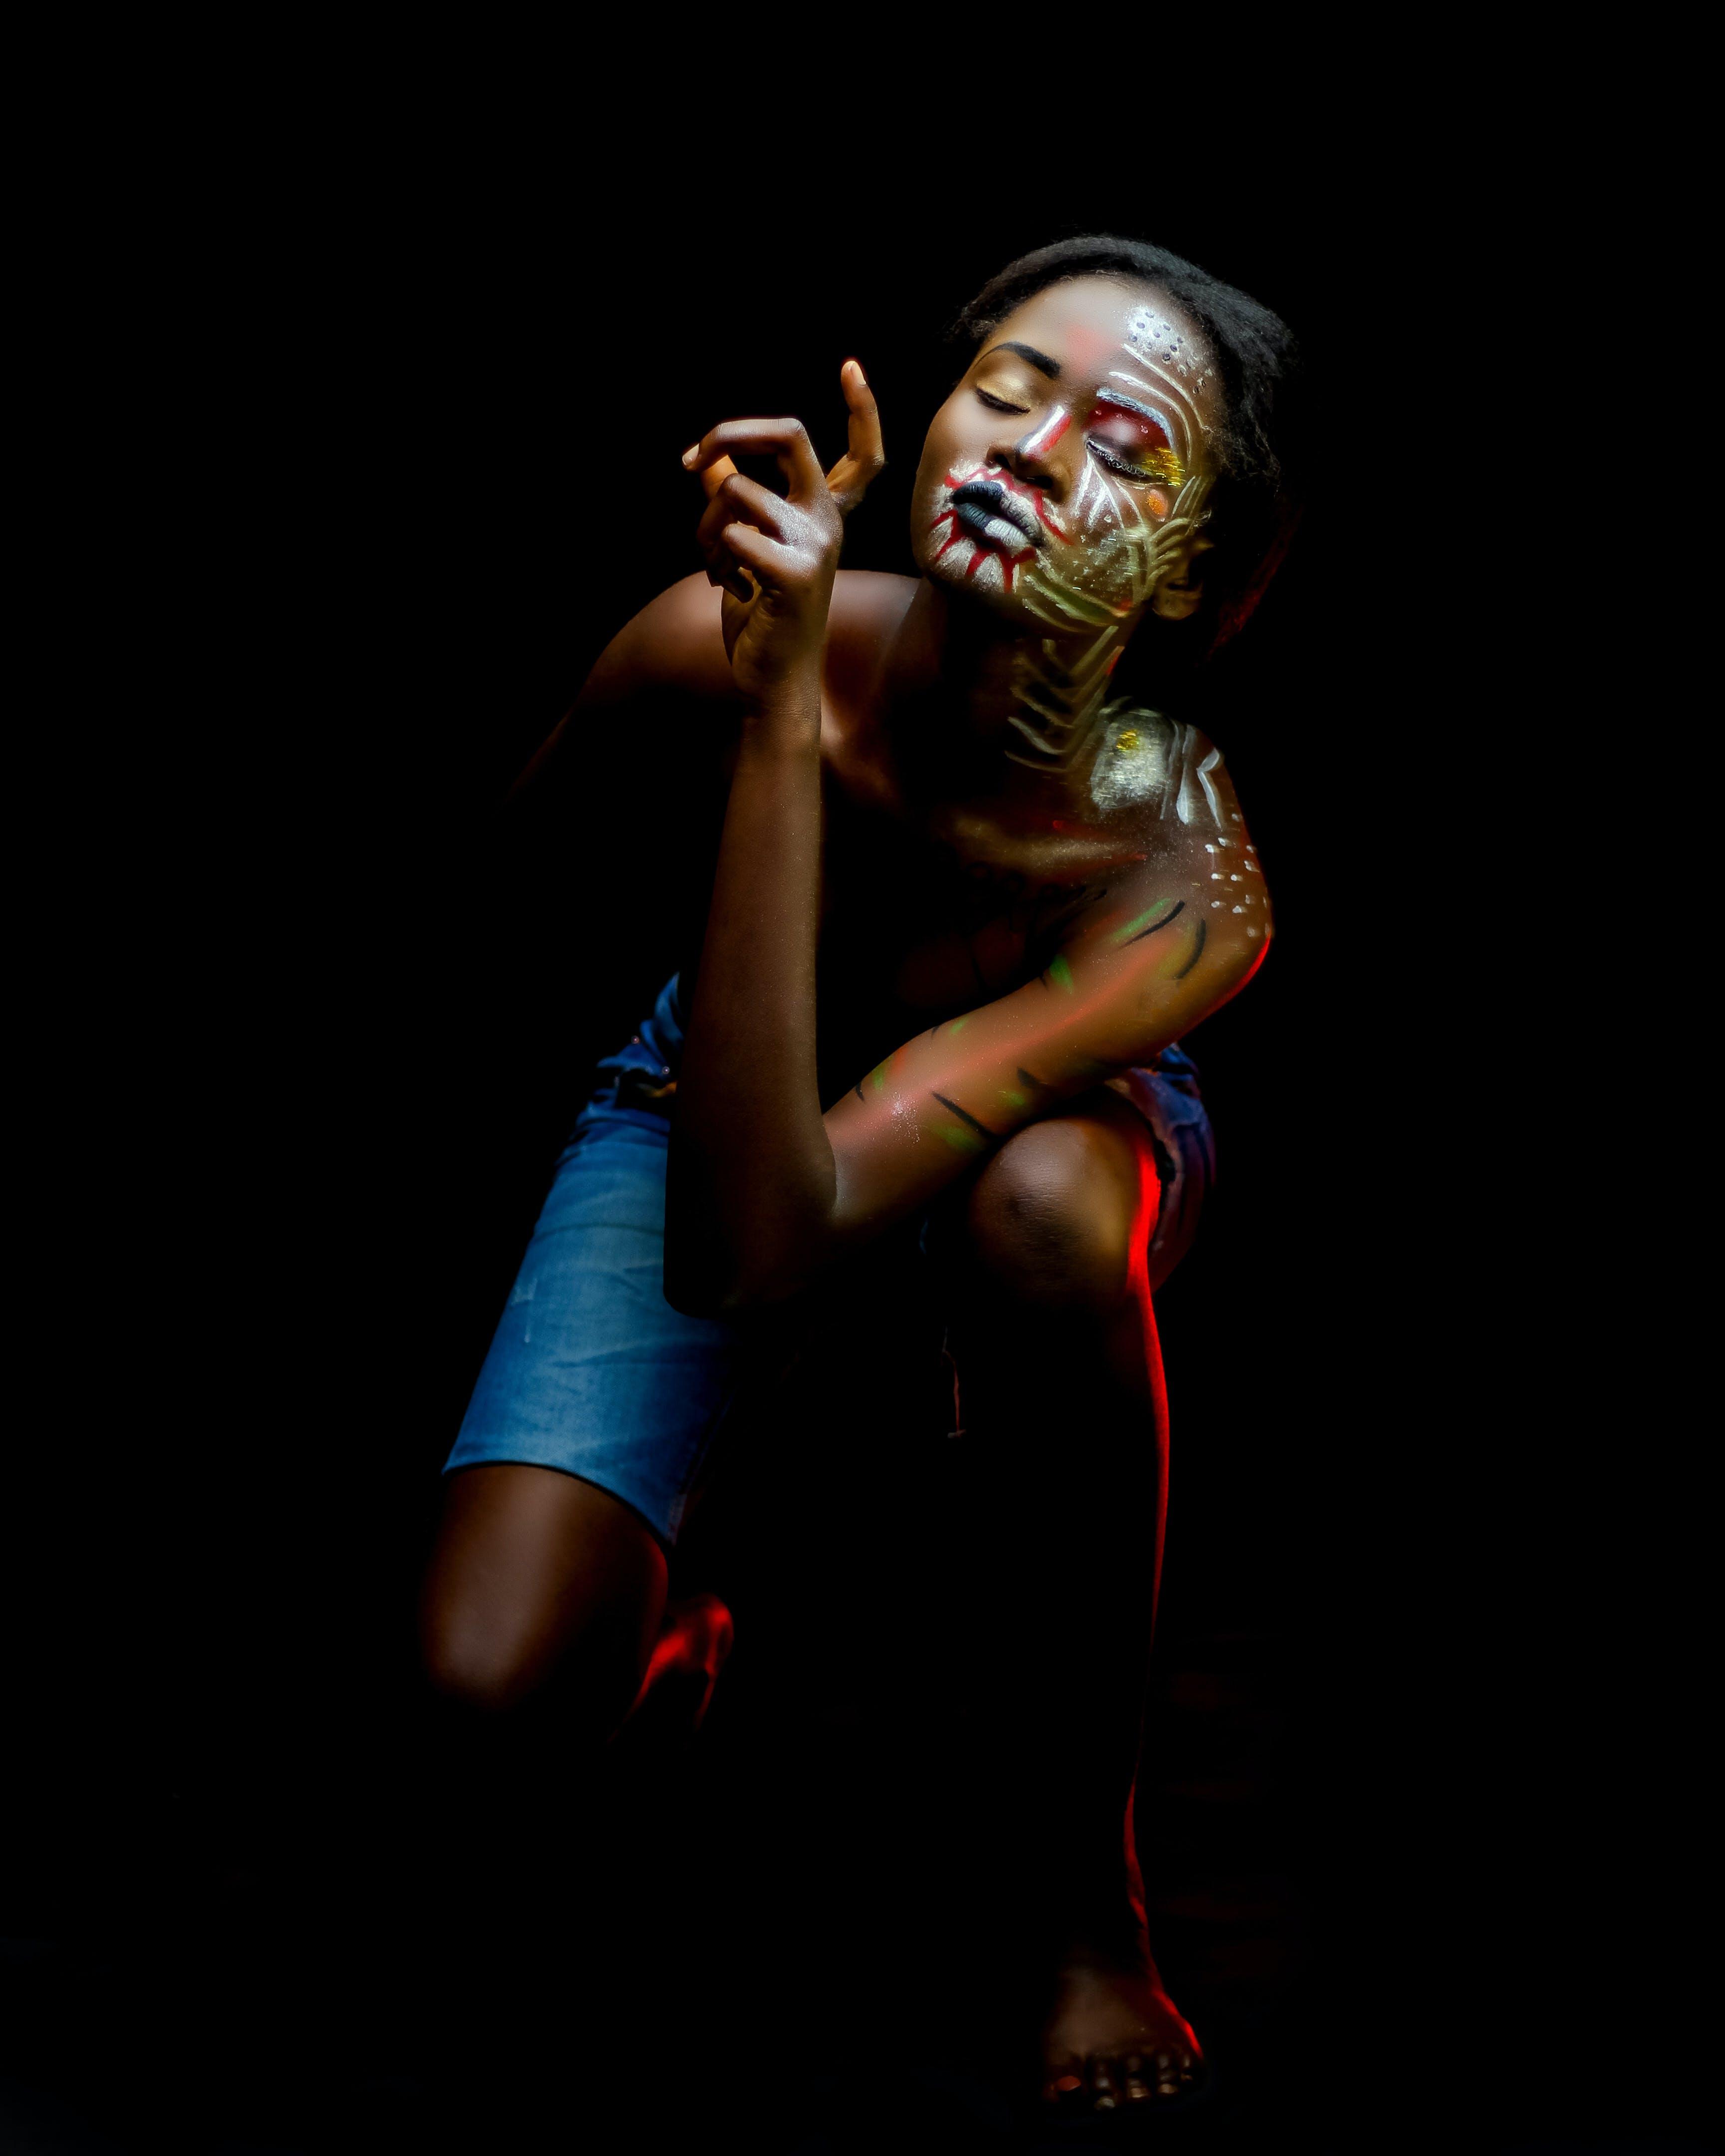 Kostenloses Stock Foto zu afroamerikaner-frau, drinnen, dunkel, farbige frau